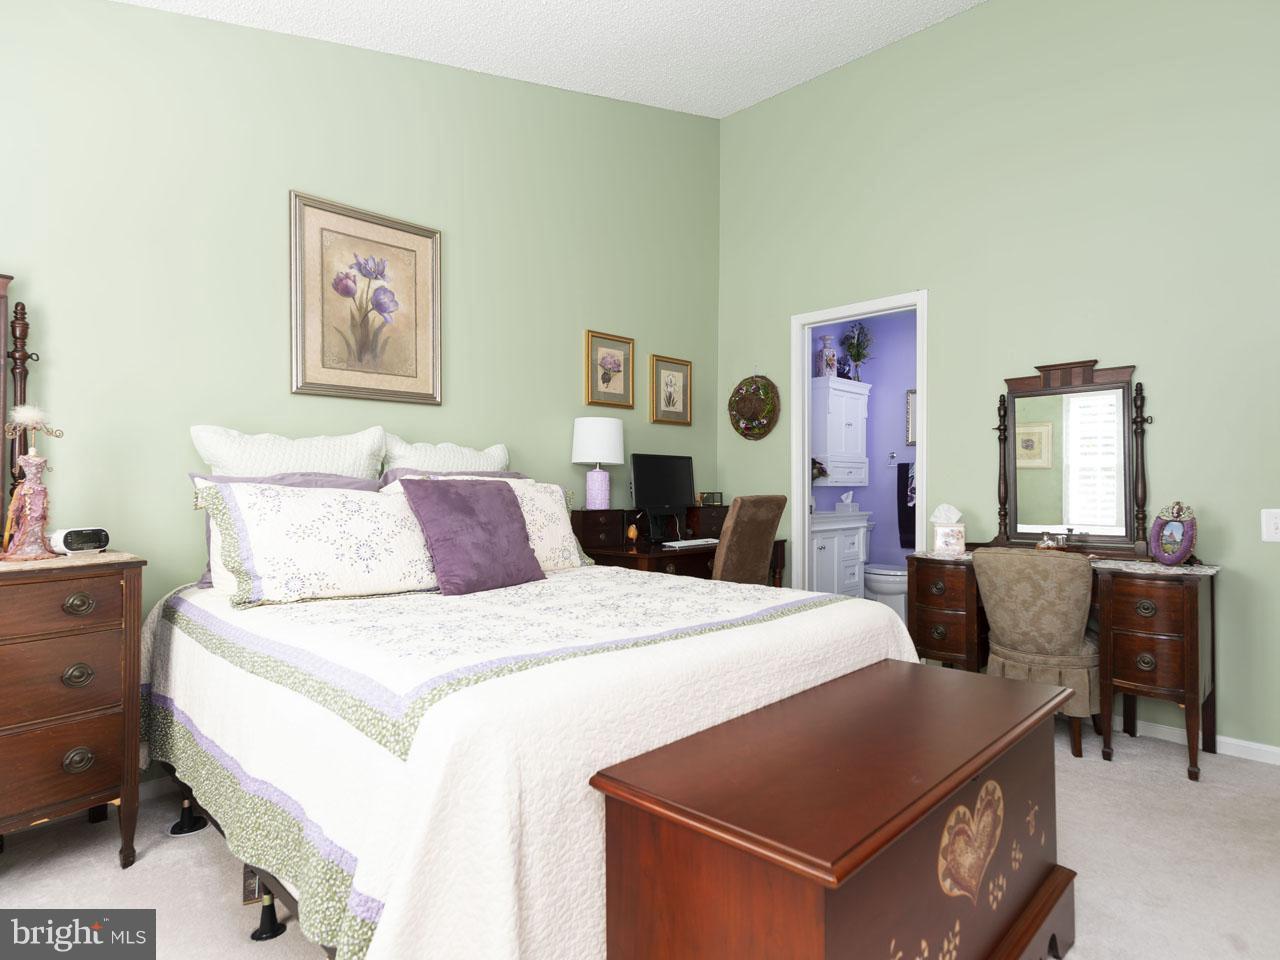 1002640508-300537943071-2021-07-22-05-00-37     Pinecrest   Alexandria Delaware Real Estate For Sale   MLS# 1002640508  - Best of Northern Virginia